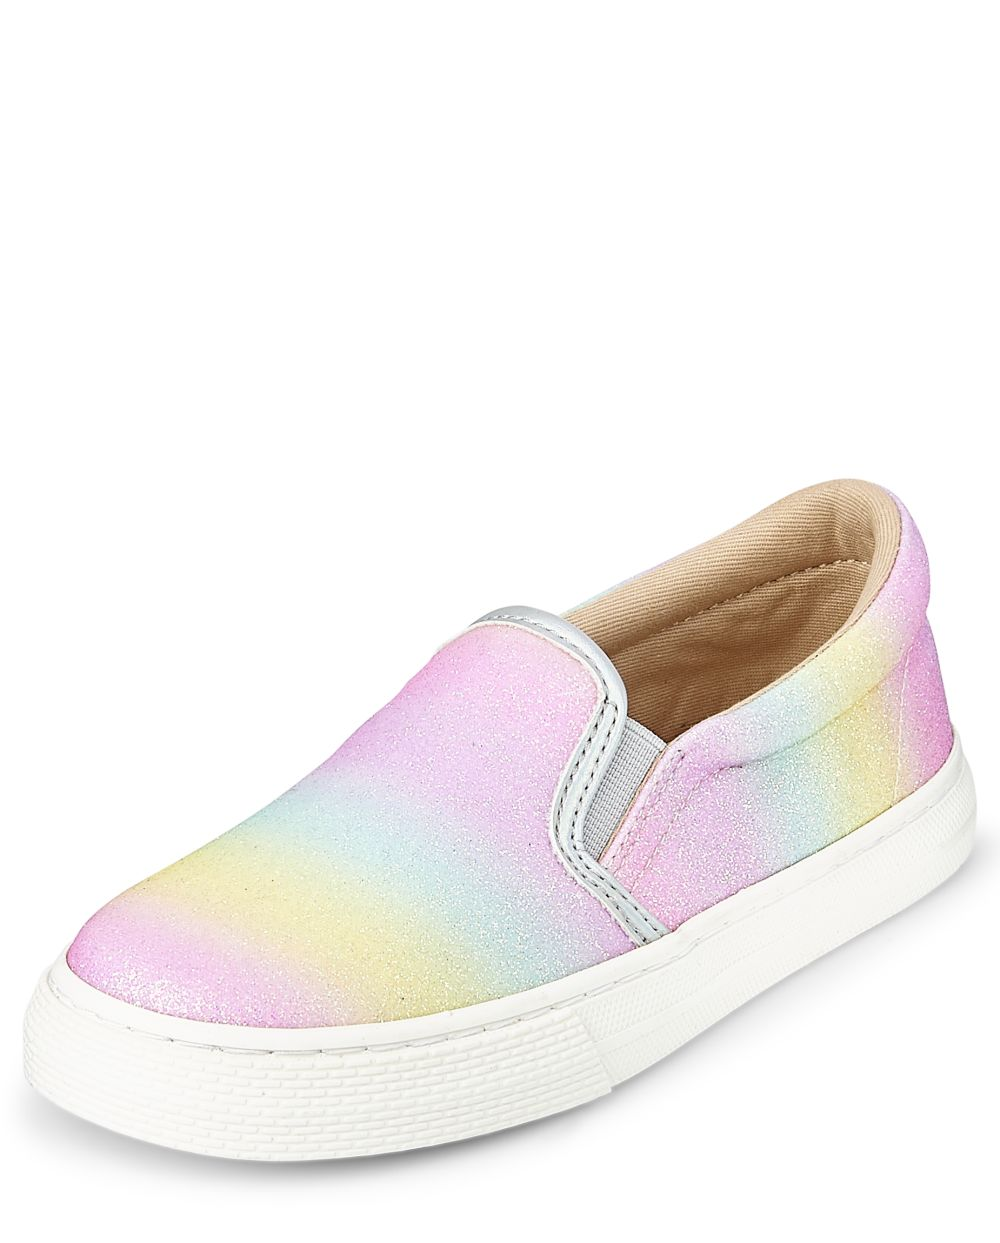 Girls Glitter Rainbow Ombre Slip On Sneakers - Multi